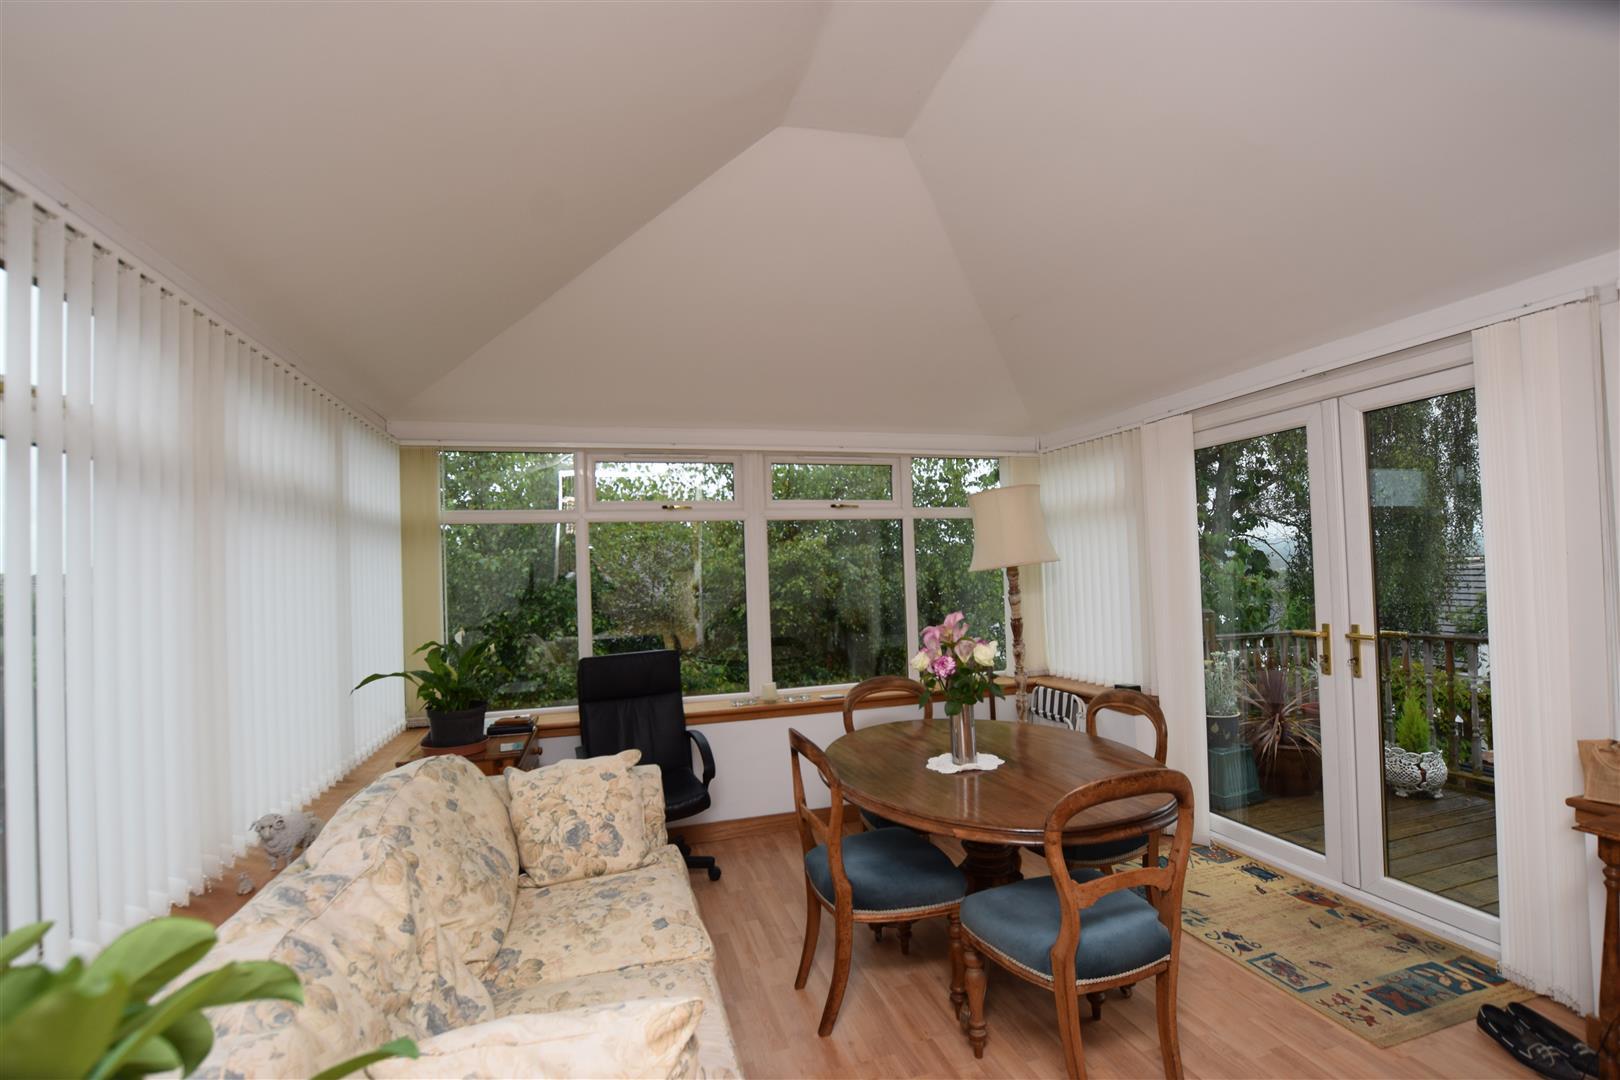 Malvern Terrace, Perth, Perthshire, PH1 1LY, UK